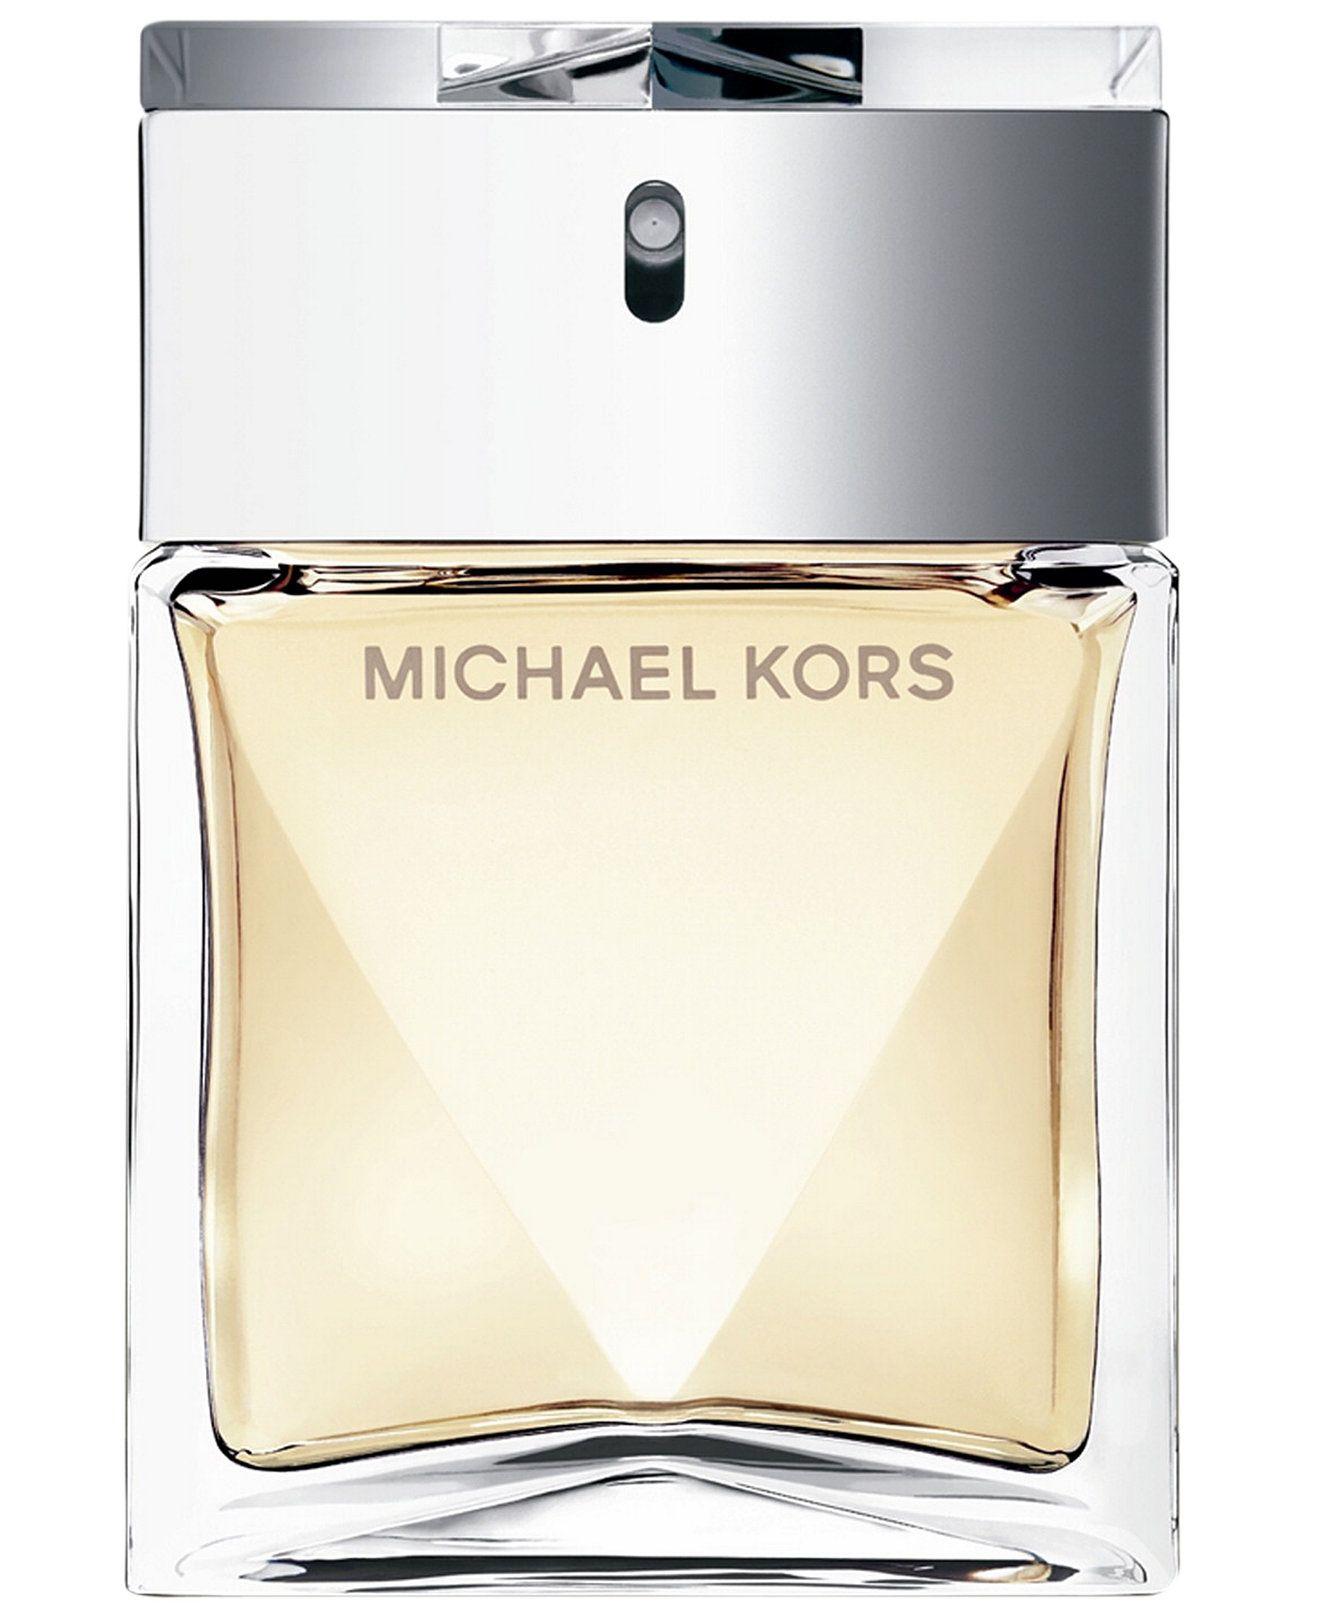 Ma Dahlia Noir Perfume Oil: Eau De Parfum Spray, 3.4 Oz En 2019